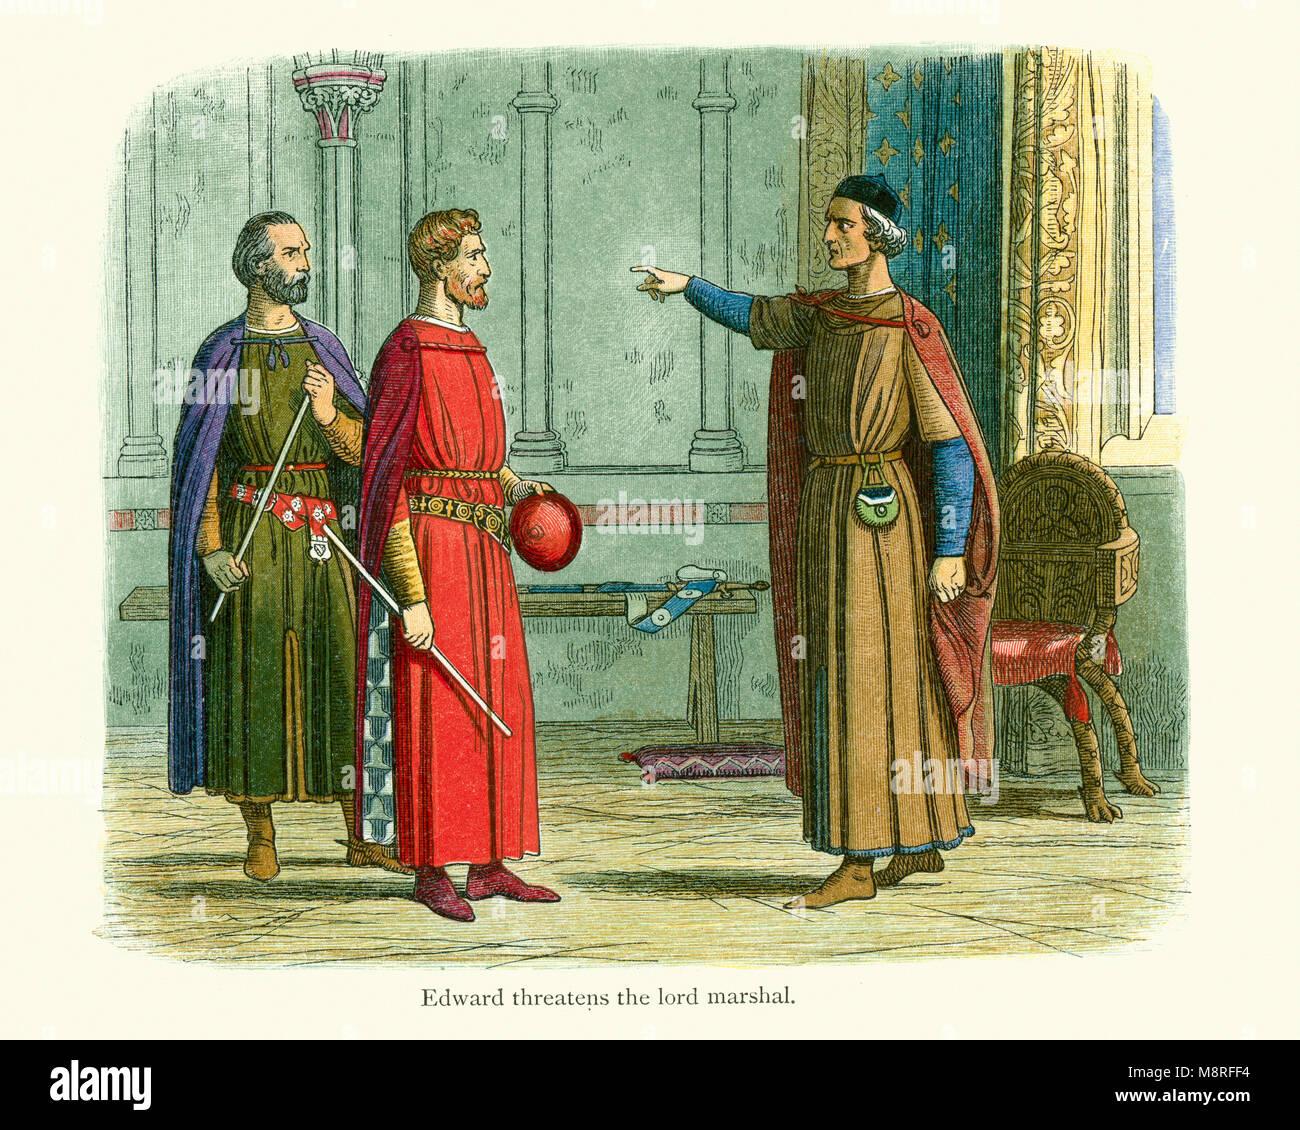 King Edward I threatening the Lord Marshal Roger Bigod Earl of Norfolk. Bigod had drawn up a series of complaints, - Stock Image